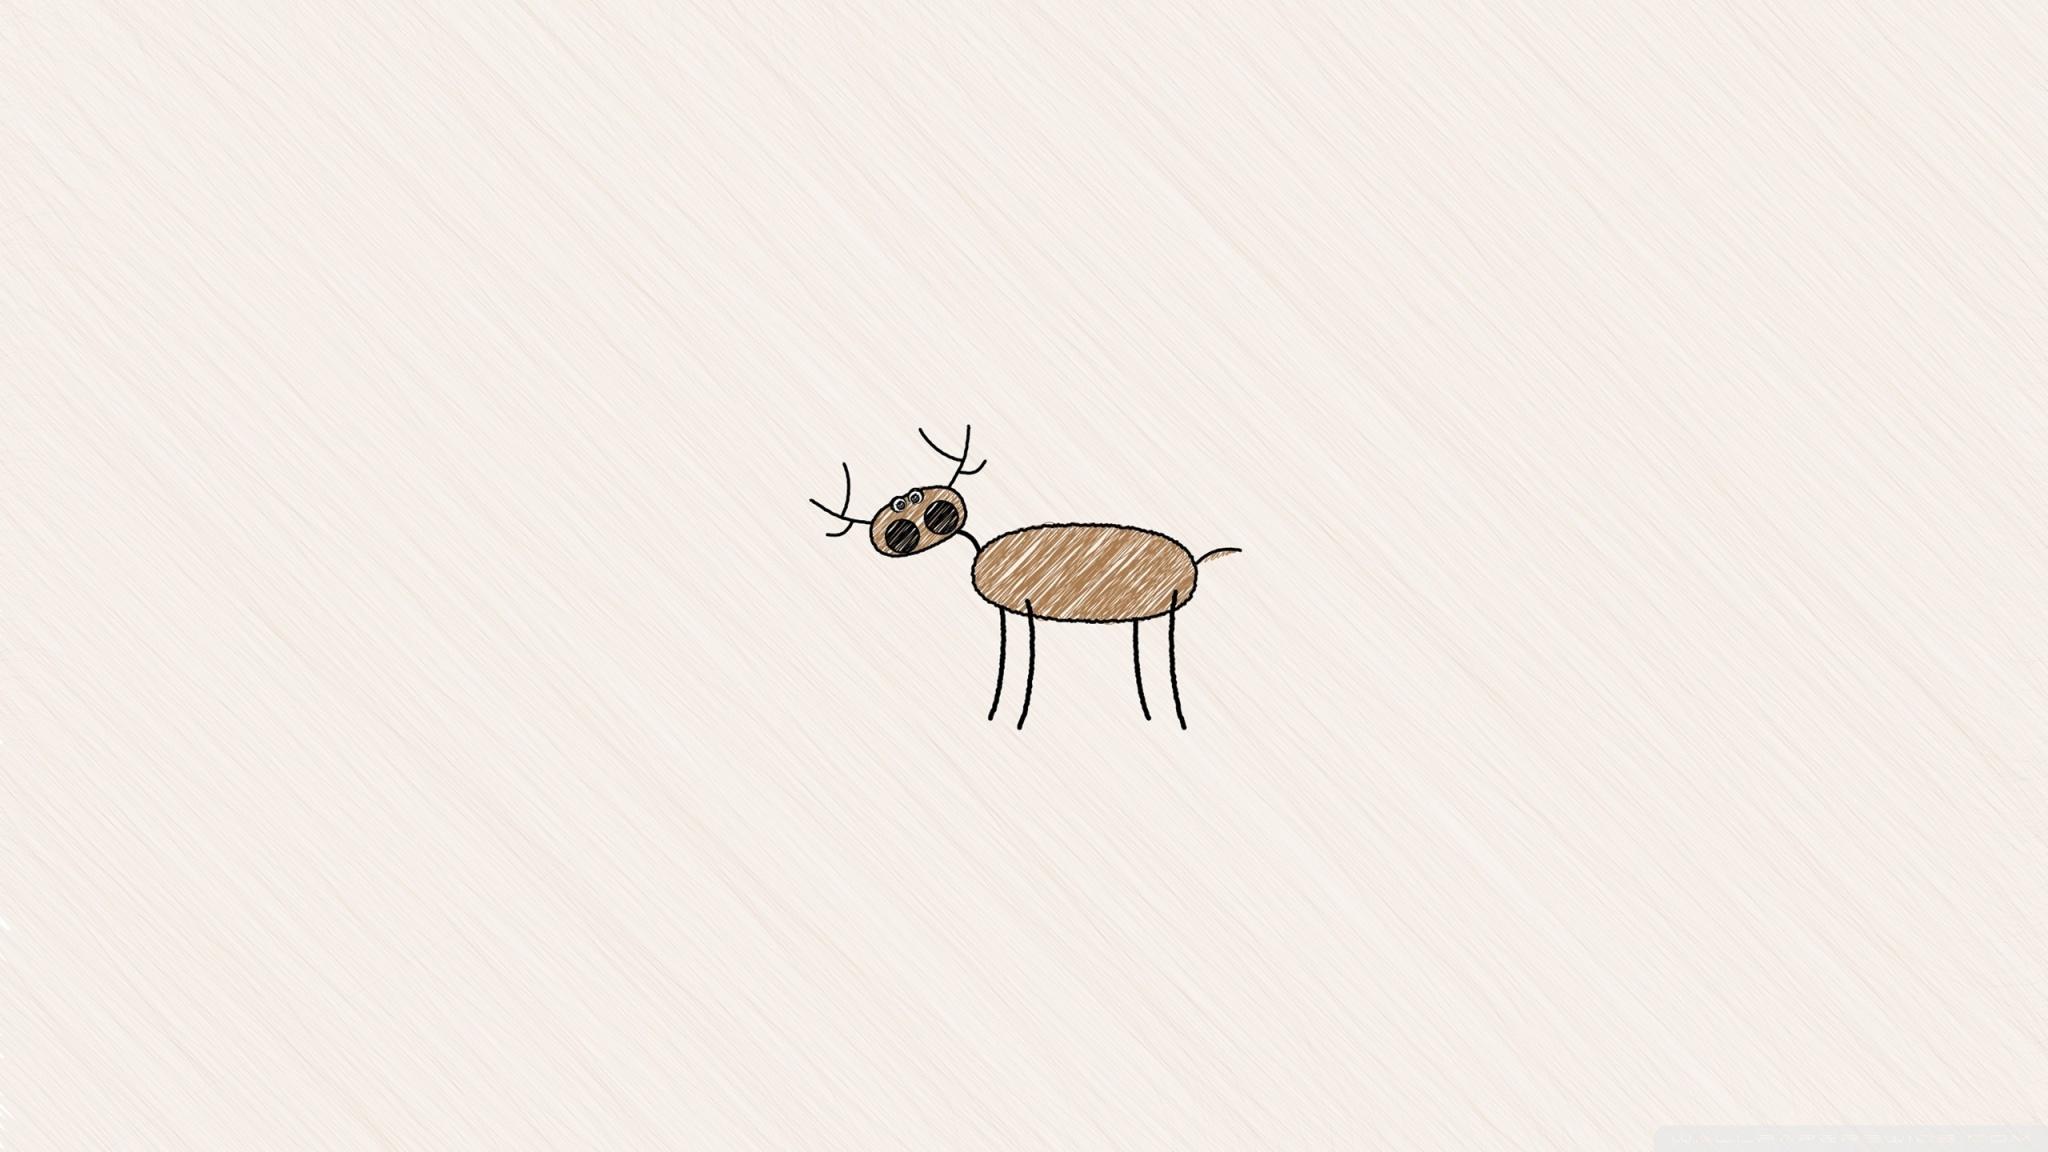 2048x1152 Funny Deer Drawing 4k Hd Desktop Wallpaper For 4k Ultra Hd Tv